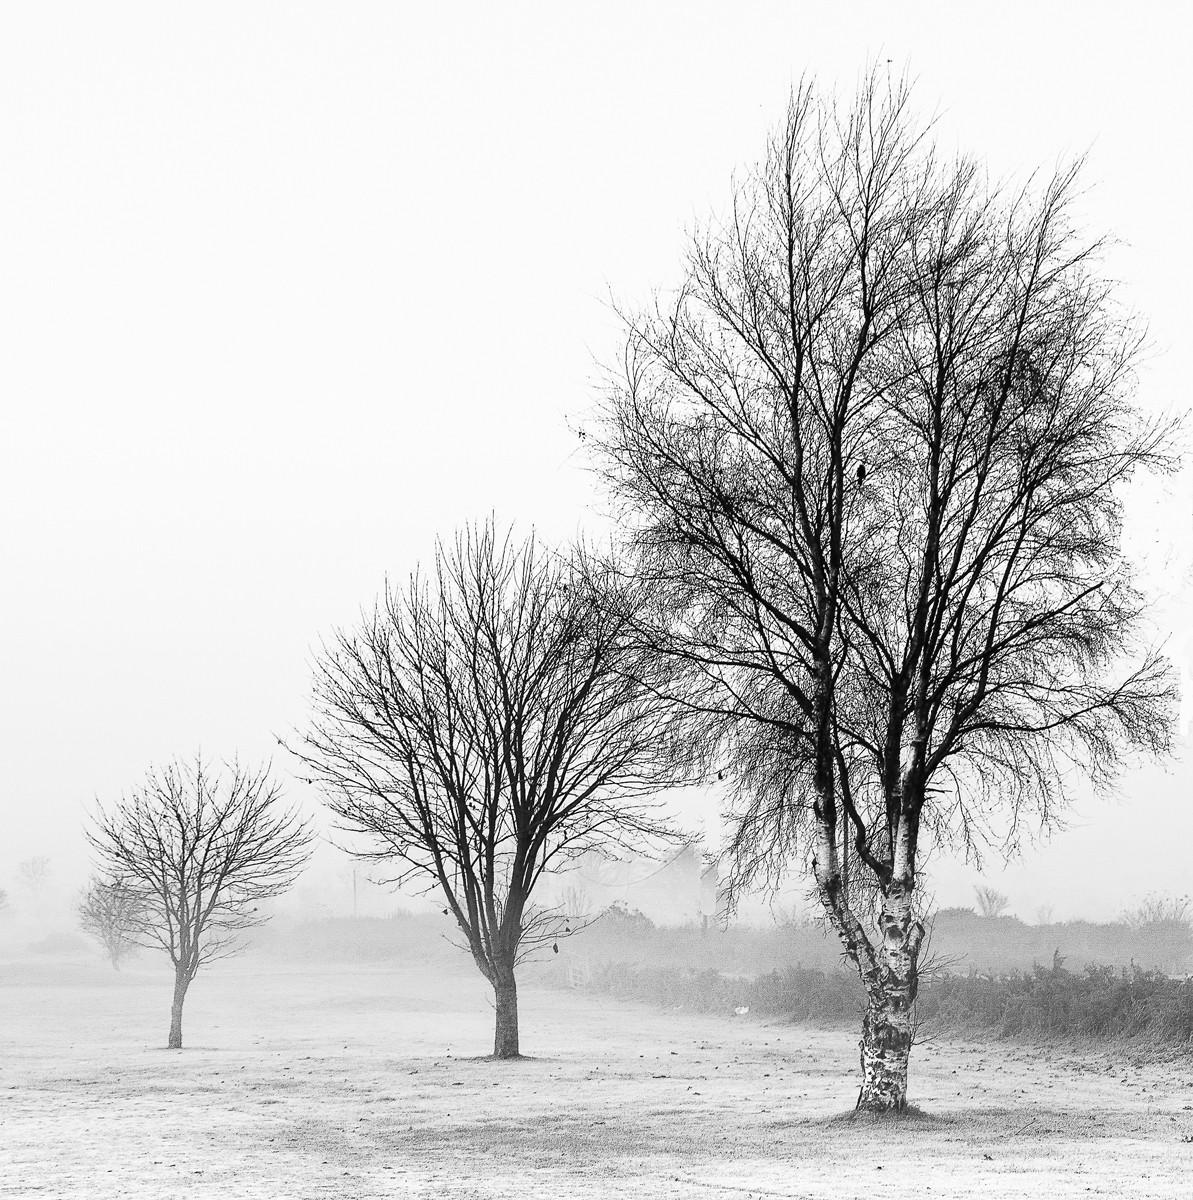 MONO - Frozen Birch by Alan Chowney (11 marks)